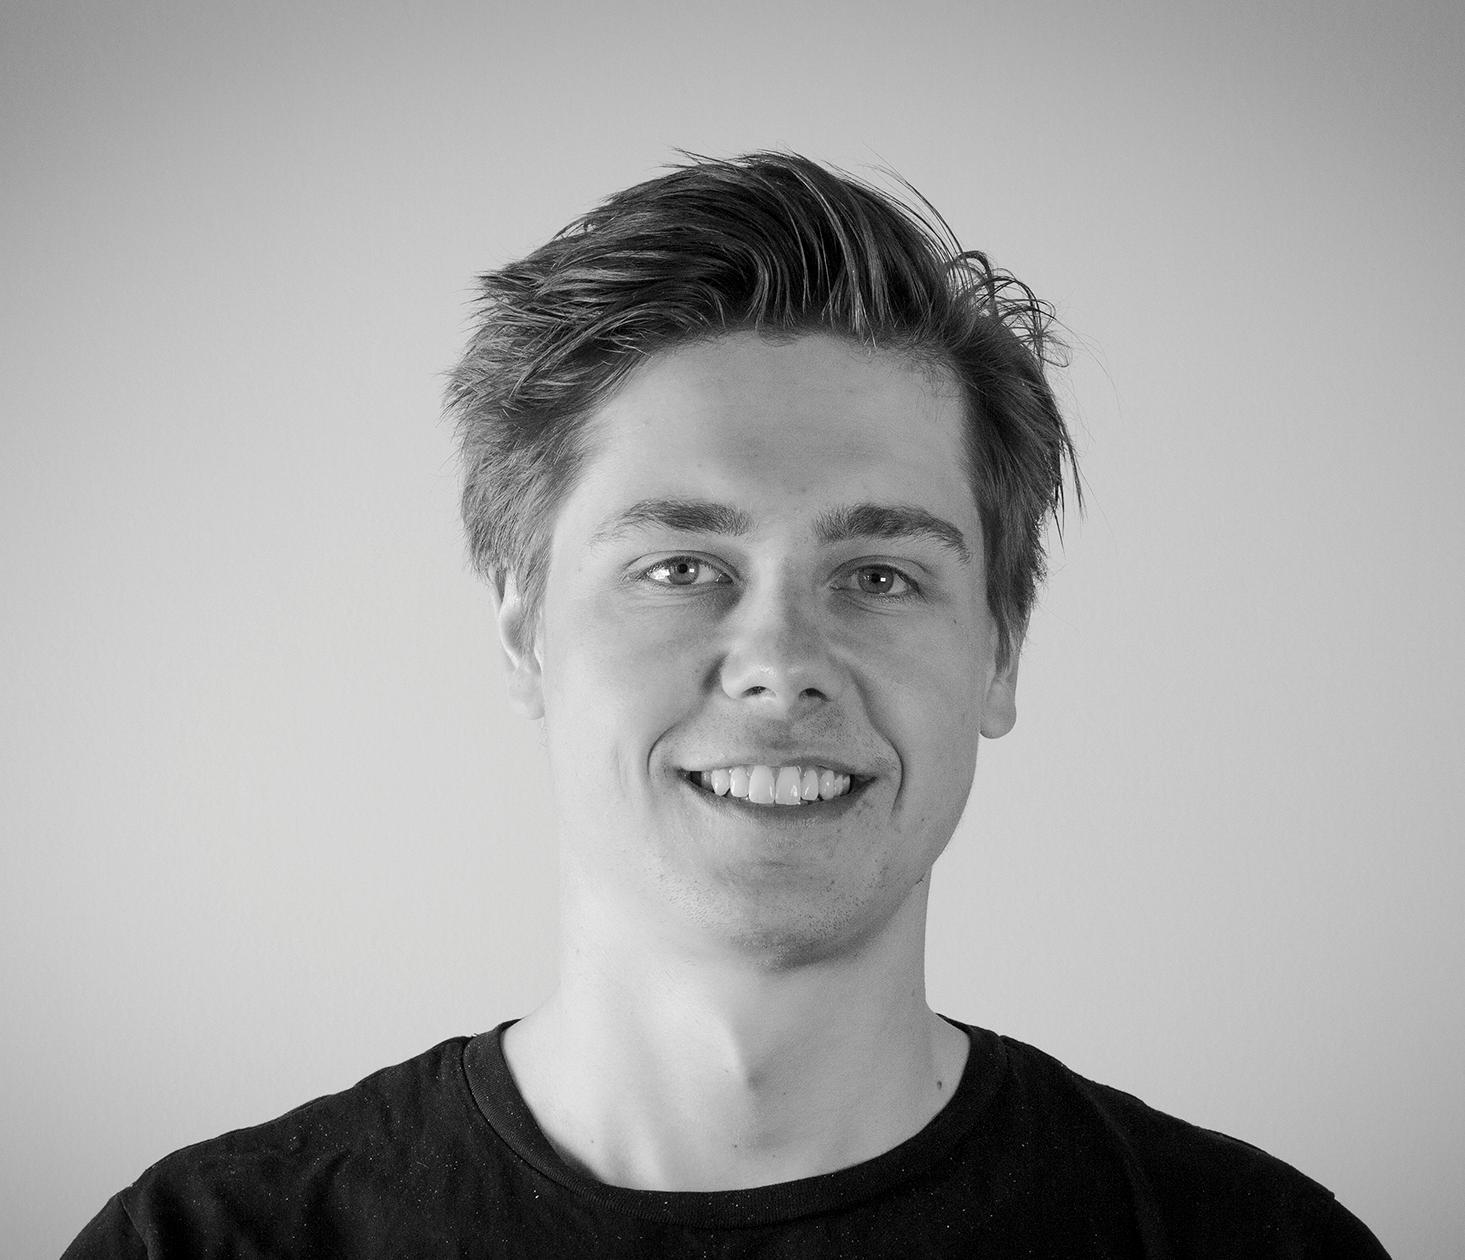 Jacob Wallersköld